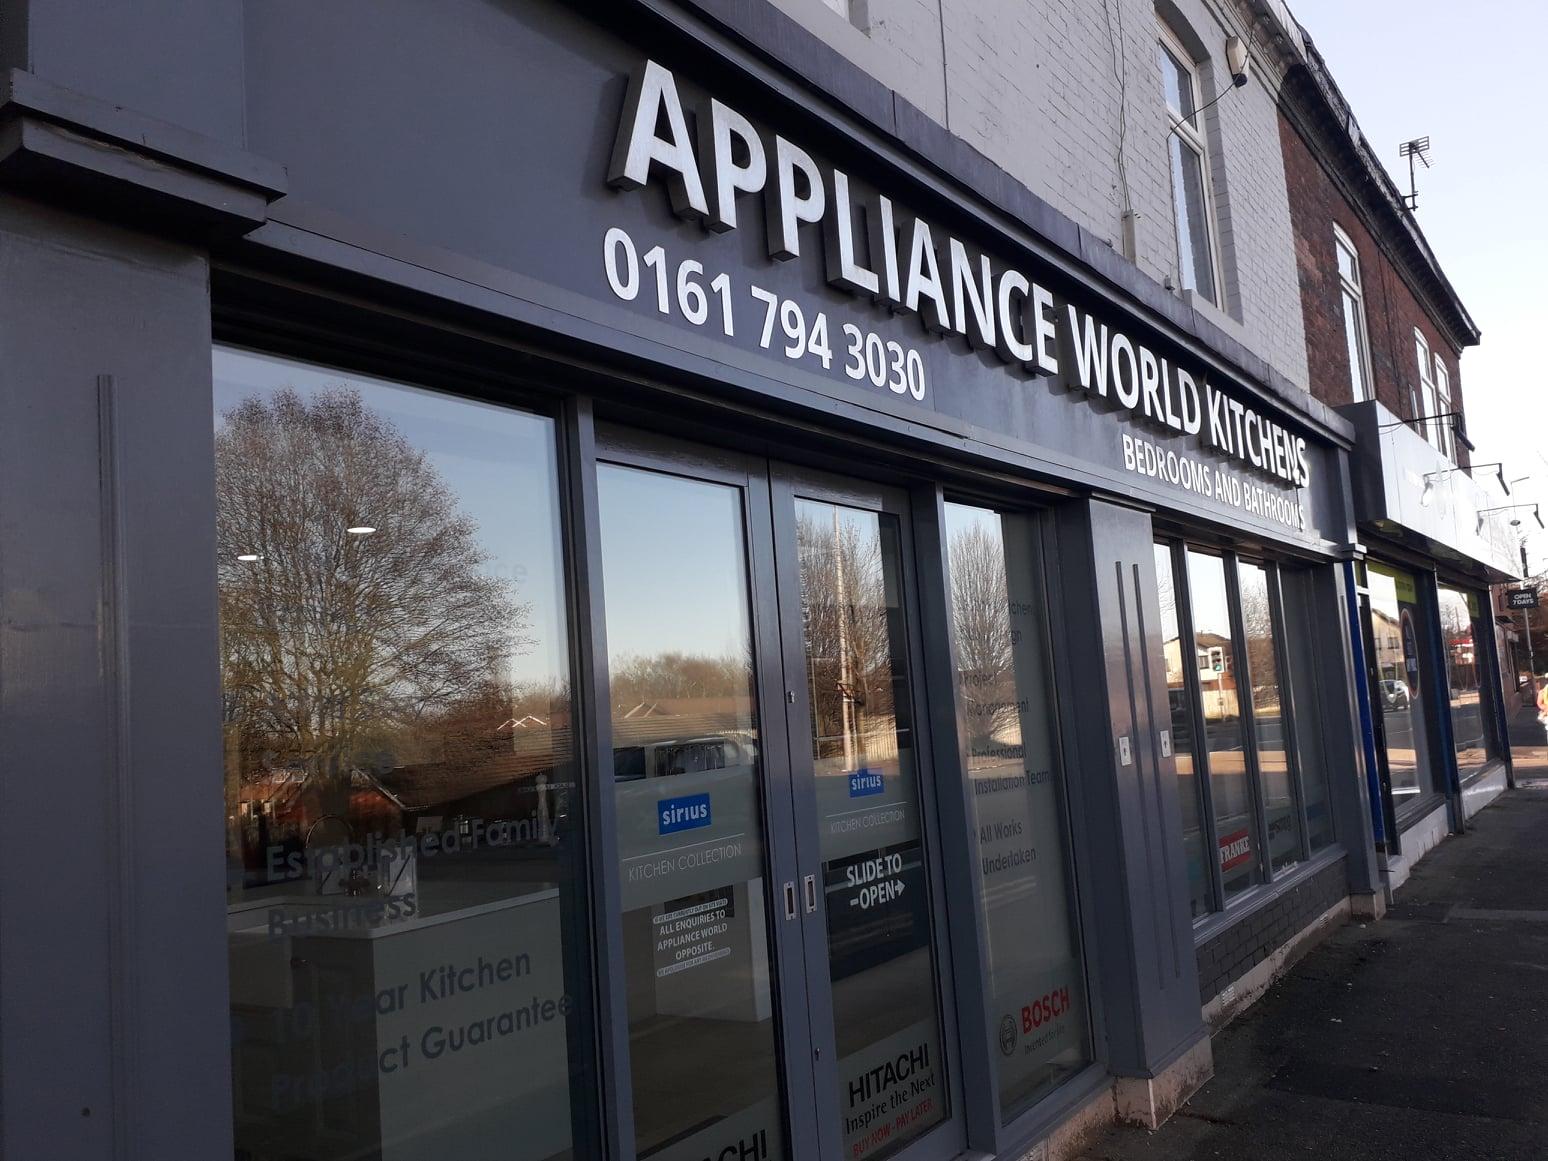 Appliance World